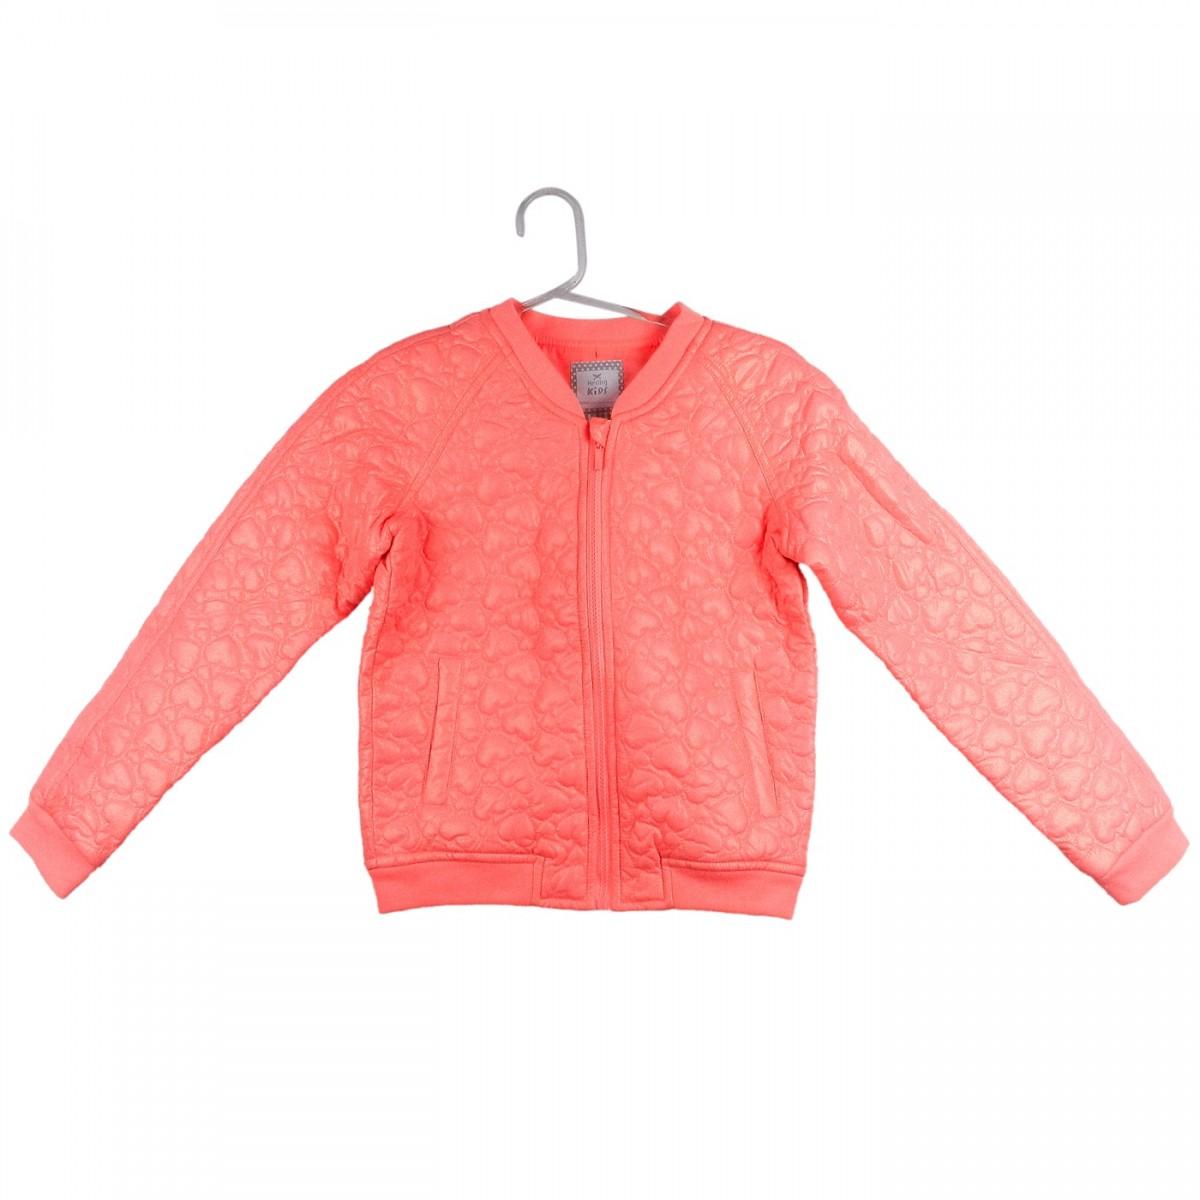 81e89dddcb Bizz Store - Jaqueta Infantil Feminina Hering Kids Matelassê